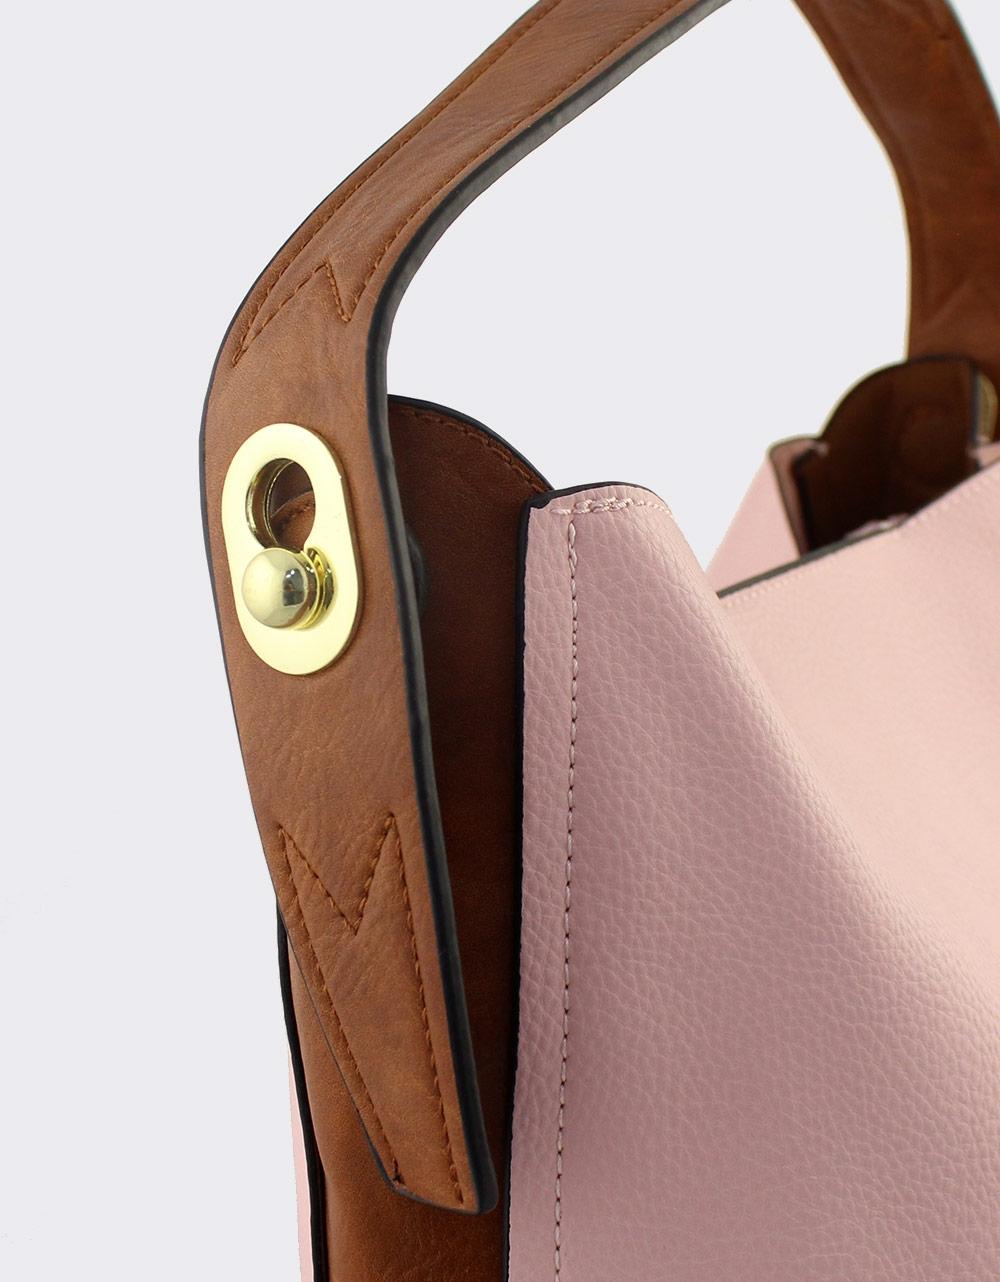 669bd8e693 Εικόνα από Γυναικείες τσάντες ώμου με εσωτερικό τσαντάκι Ροζ